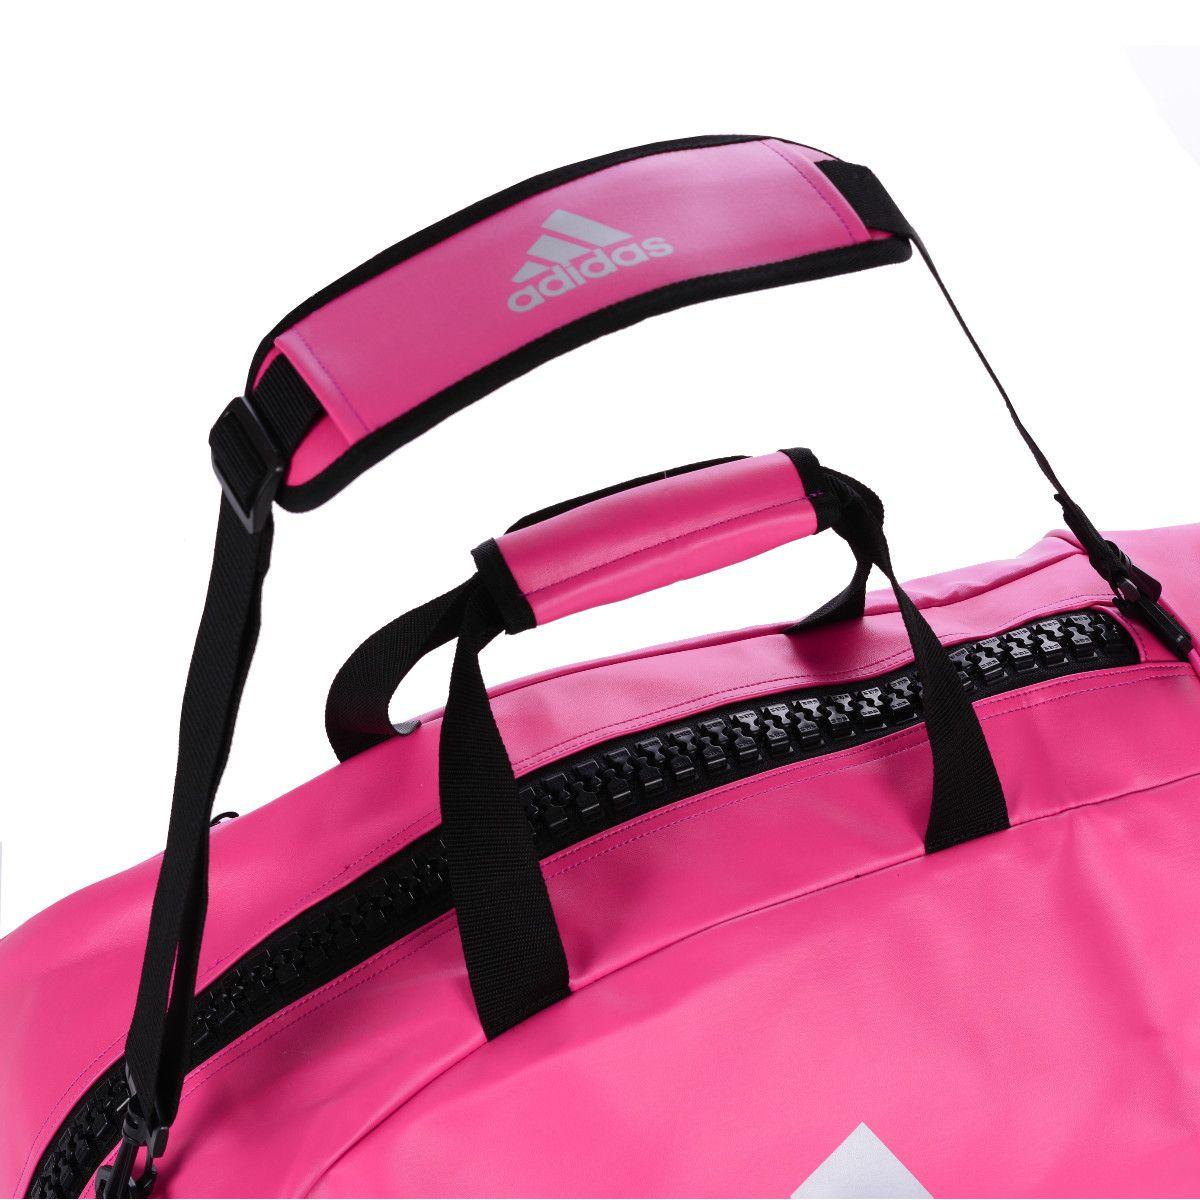 Contra la voluntad acerca de Receptor  Bolsa Mochila Adidas Judo 2in1 PU Rosa/Prata - Made4fighters | Feita para  lutadores !